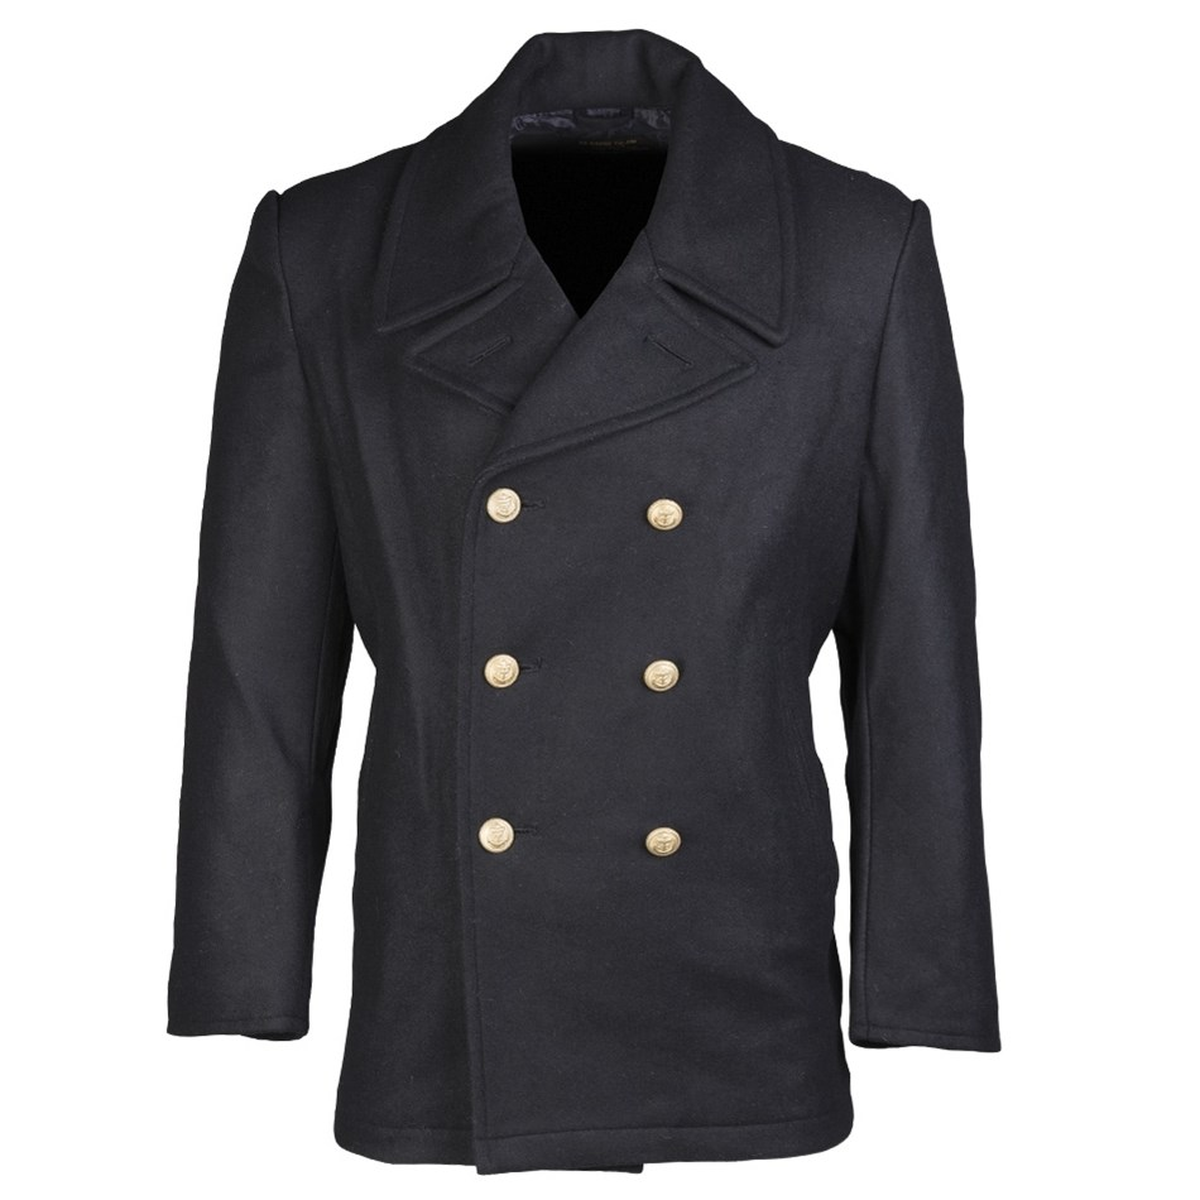 Kabát BW MARINE vlněný  NAVY MIL-TEC® 10578000 L-11